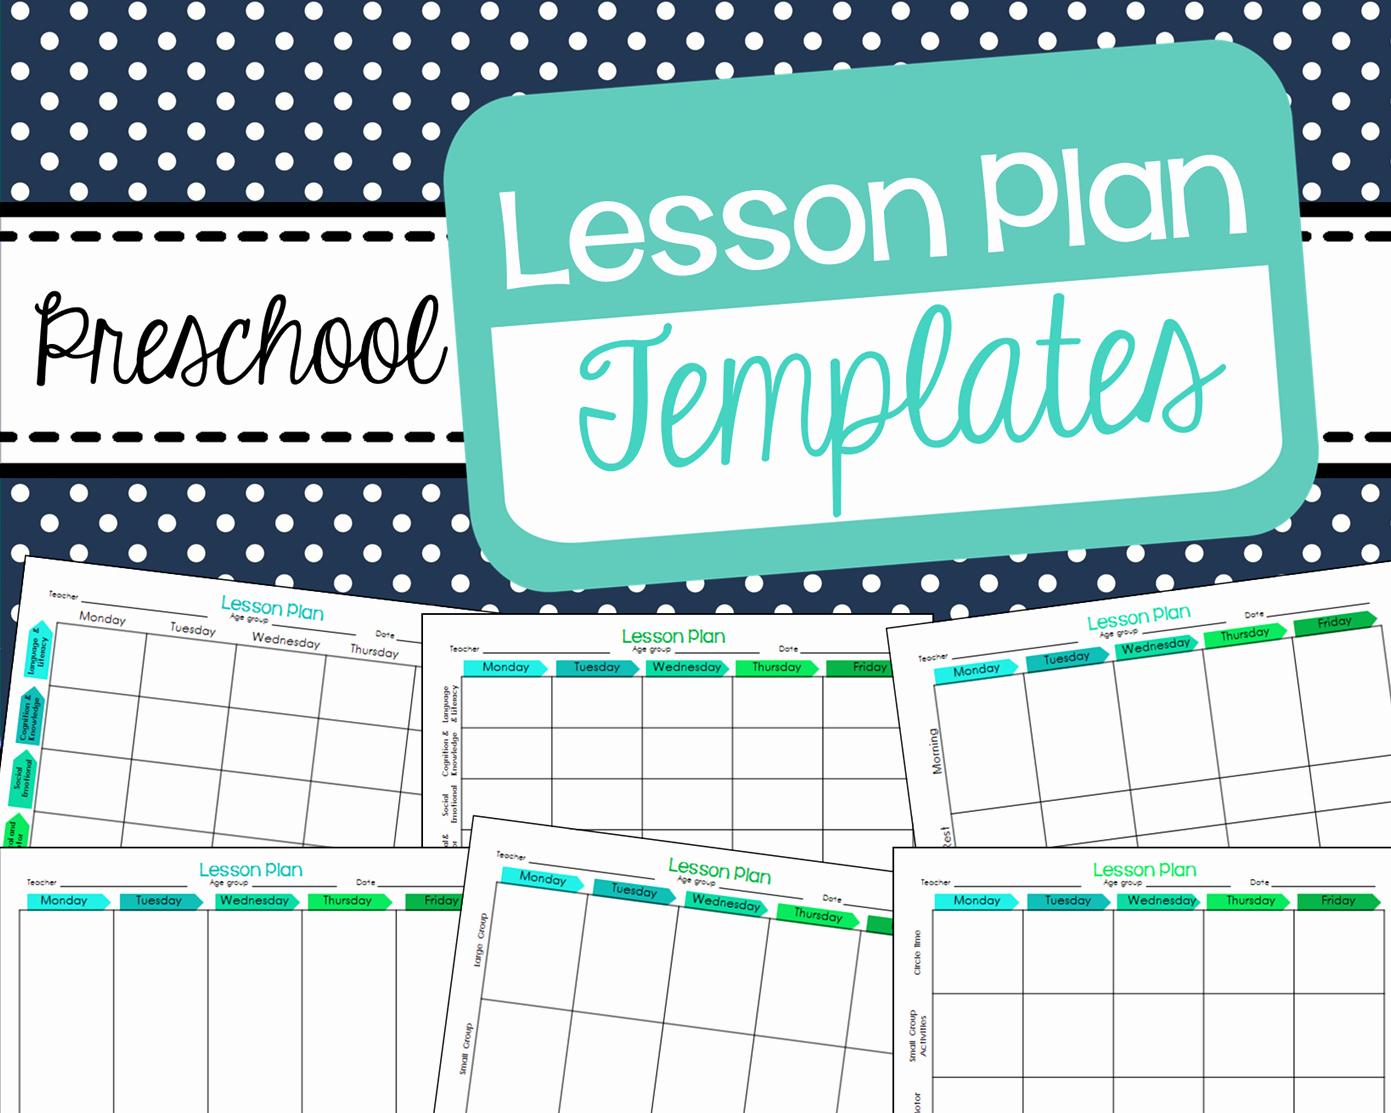 Lesson Plans Templates for Preschool Fresh Free Preschool Lesson Plan Templates